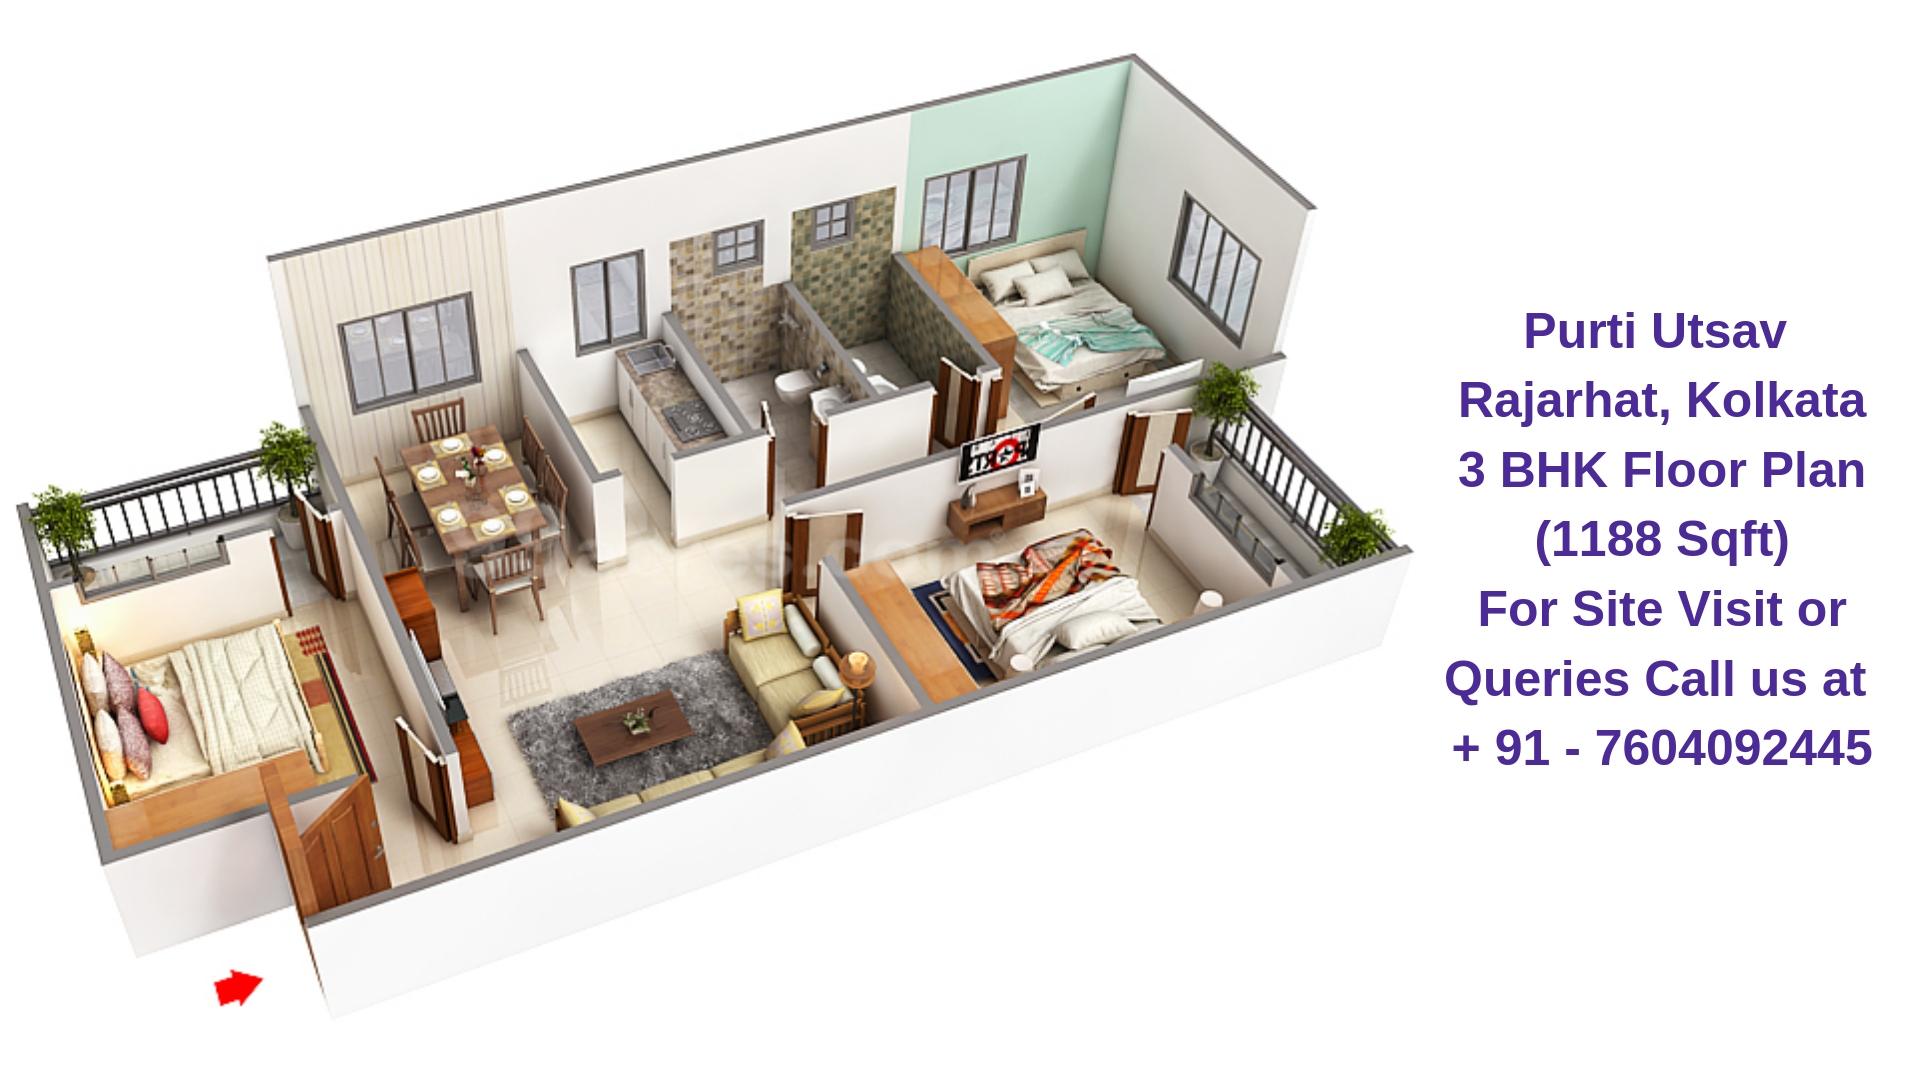 Purti Utsav Rajarhat Kolkata 3 BHK Floor Plan